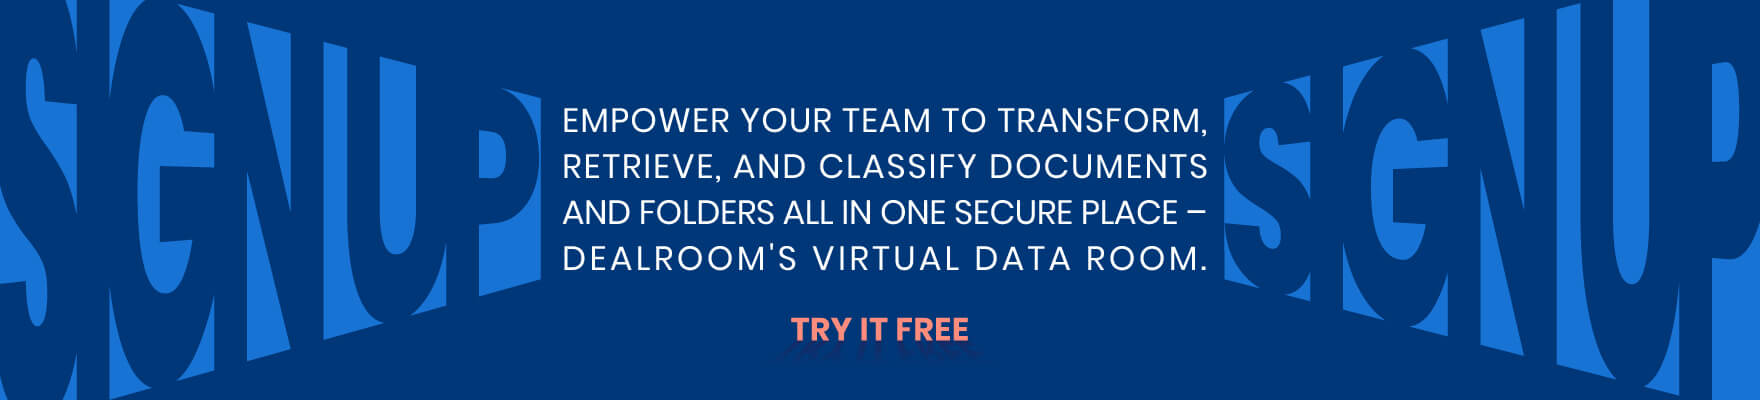 free trial of VDR